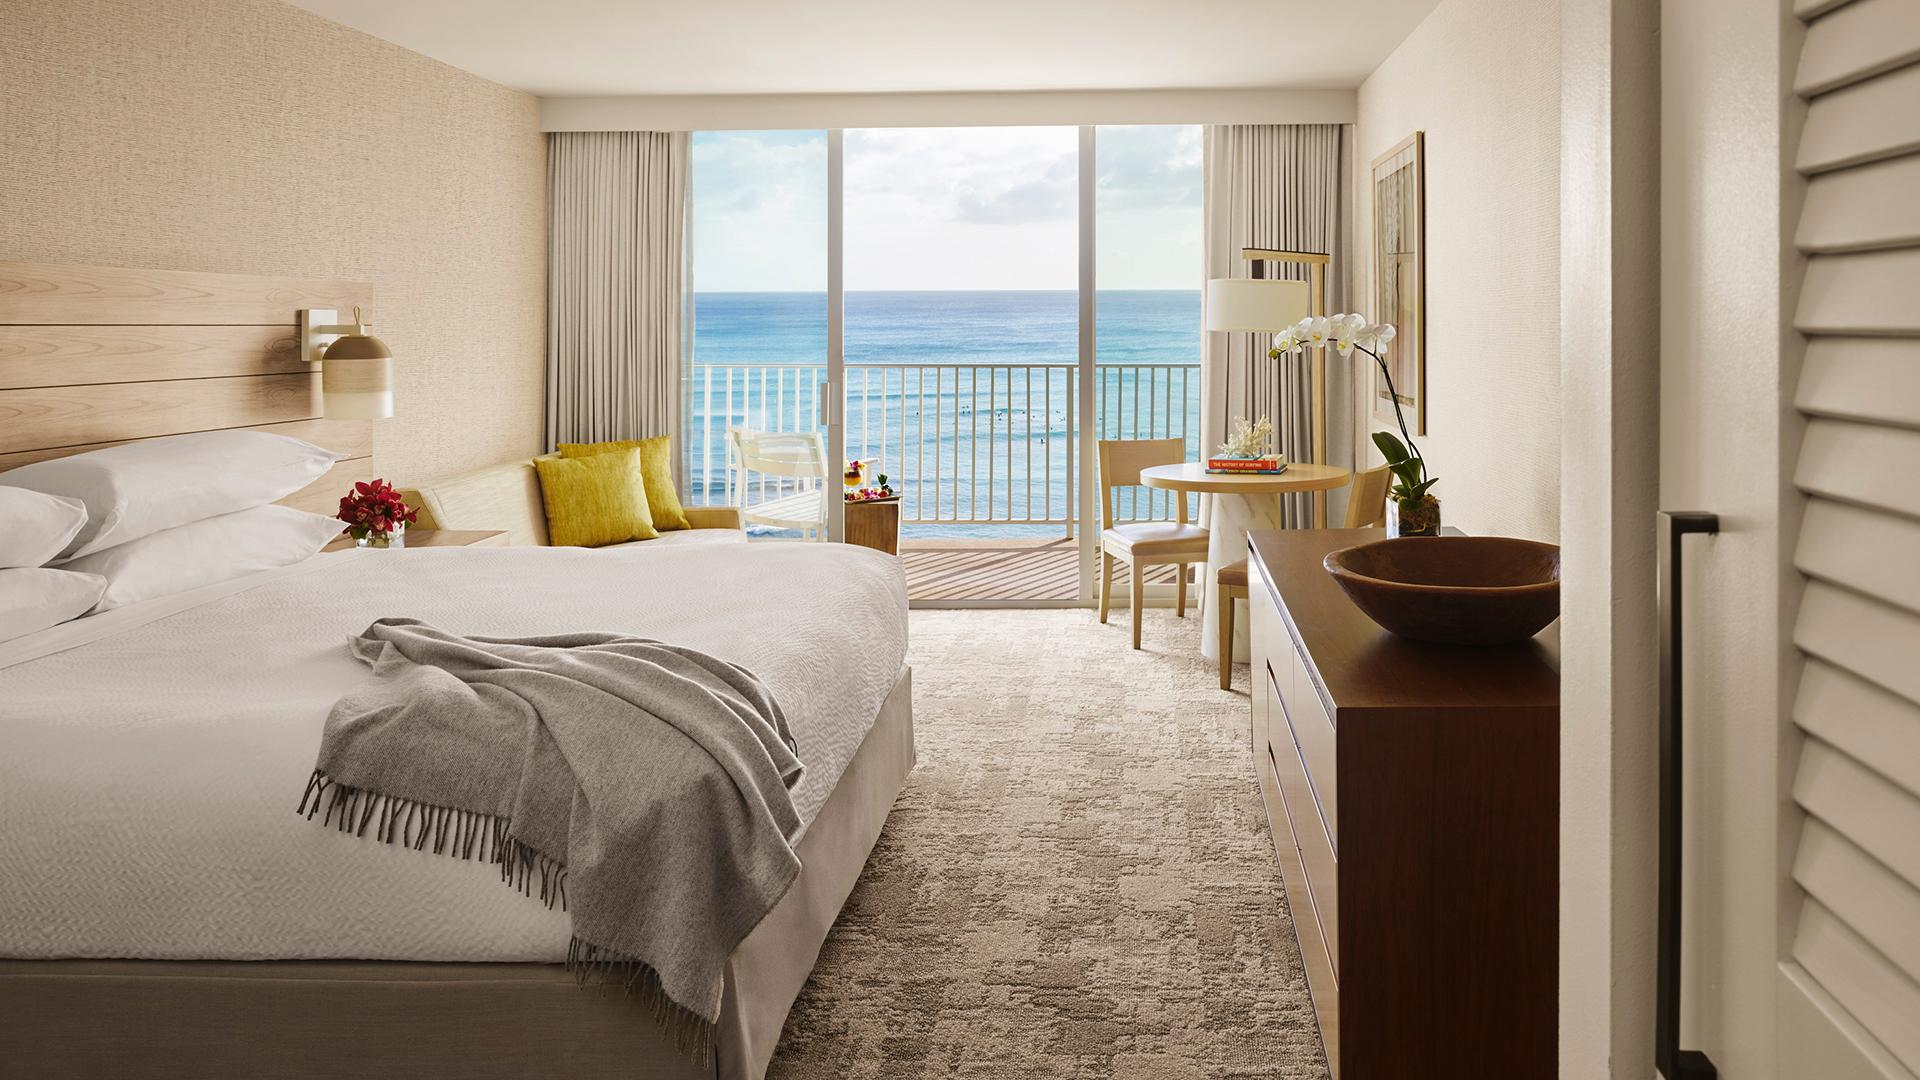 Premier Oceanfront King image 1 at 'Alohilani Resort Waikiki Beach by Honolulu County, Hawaii, United States